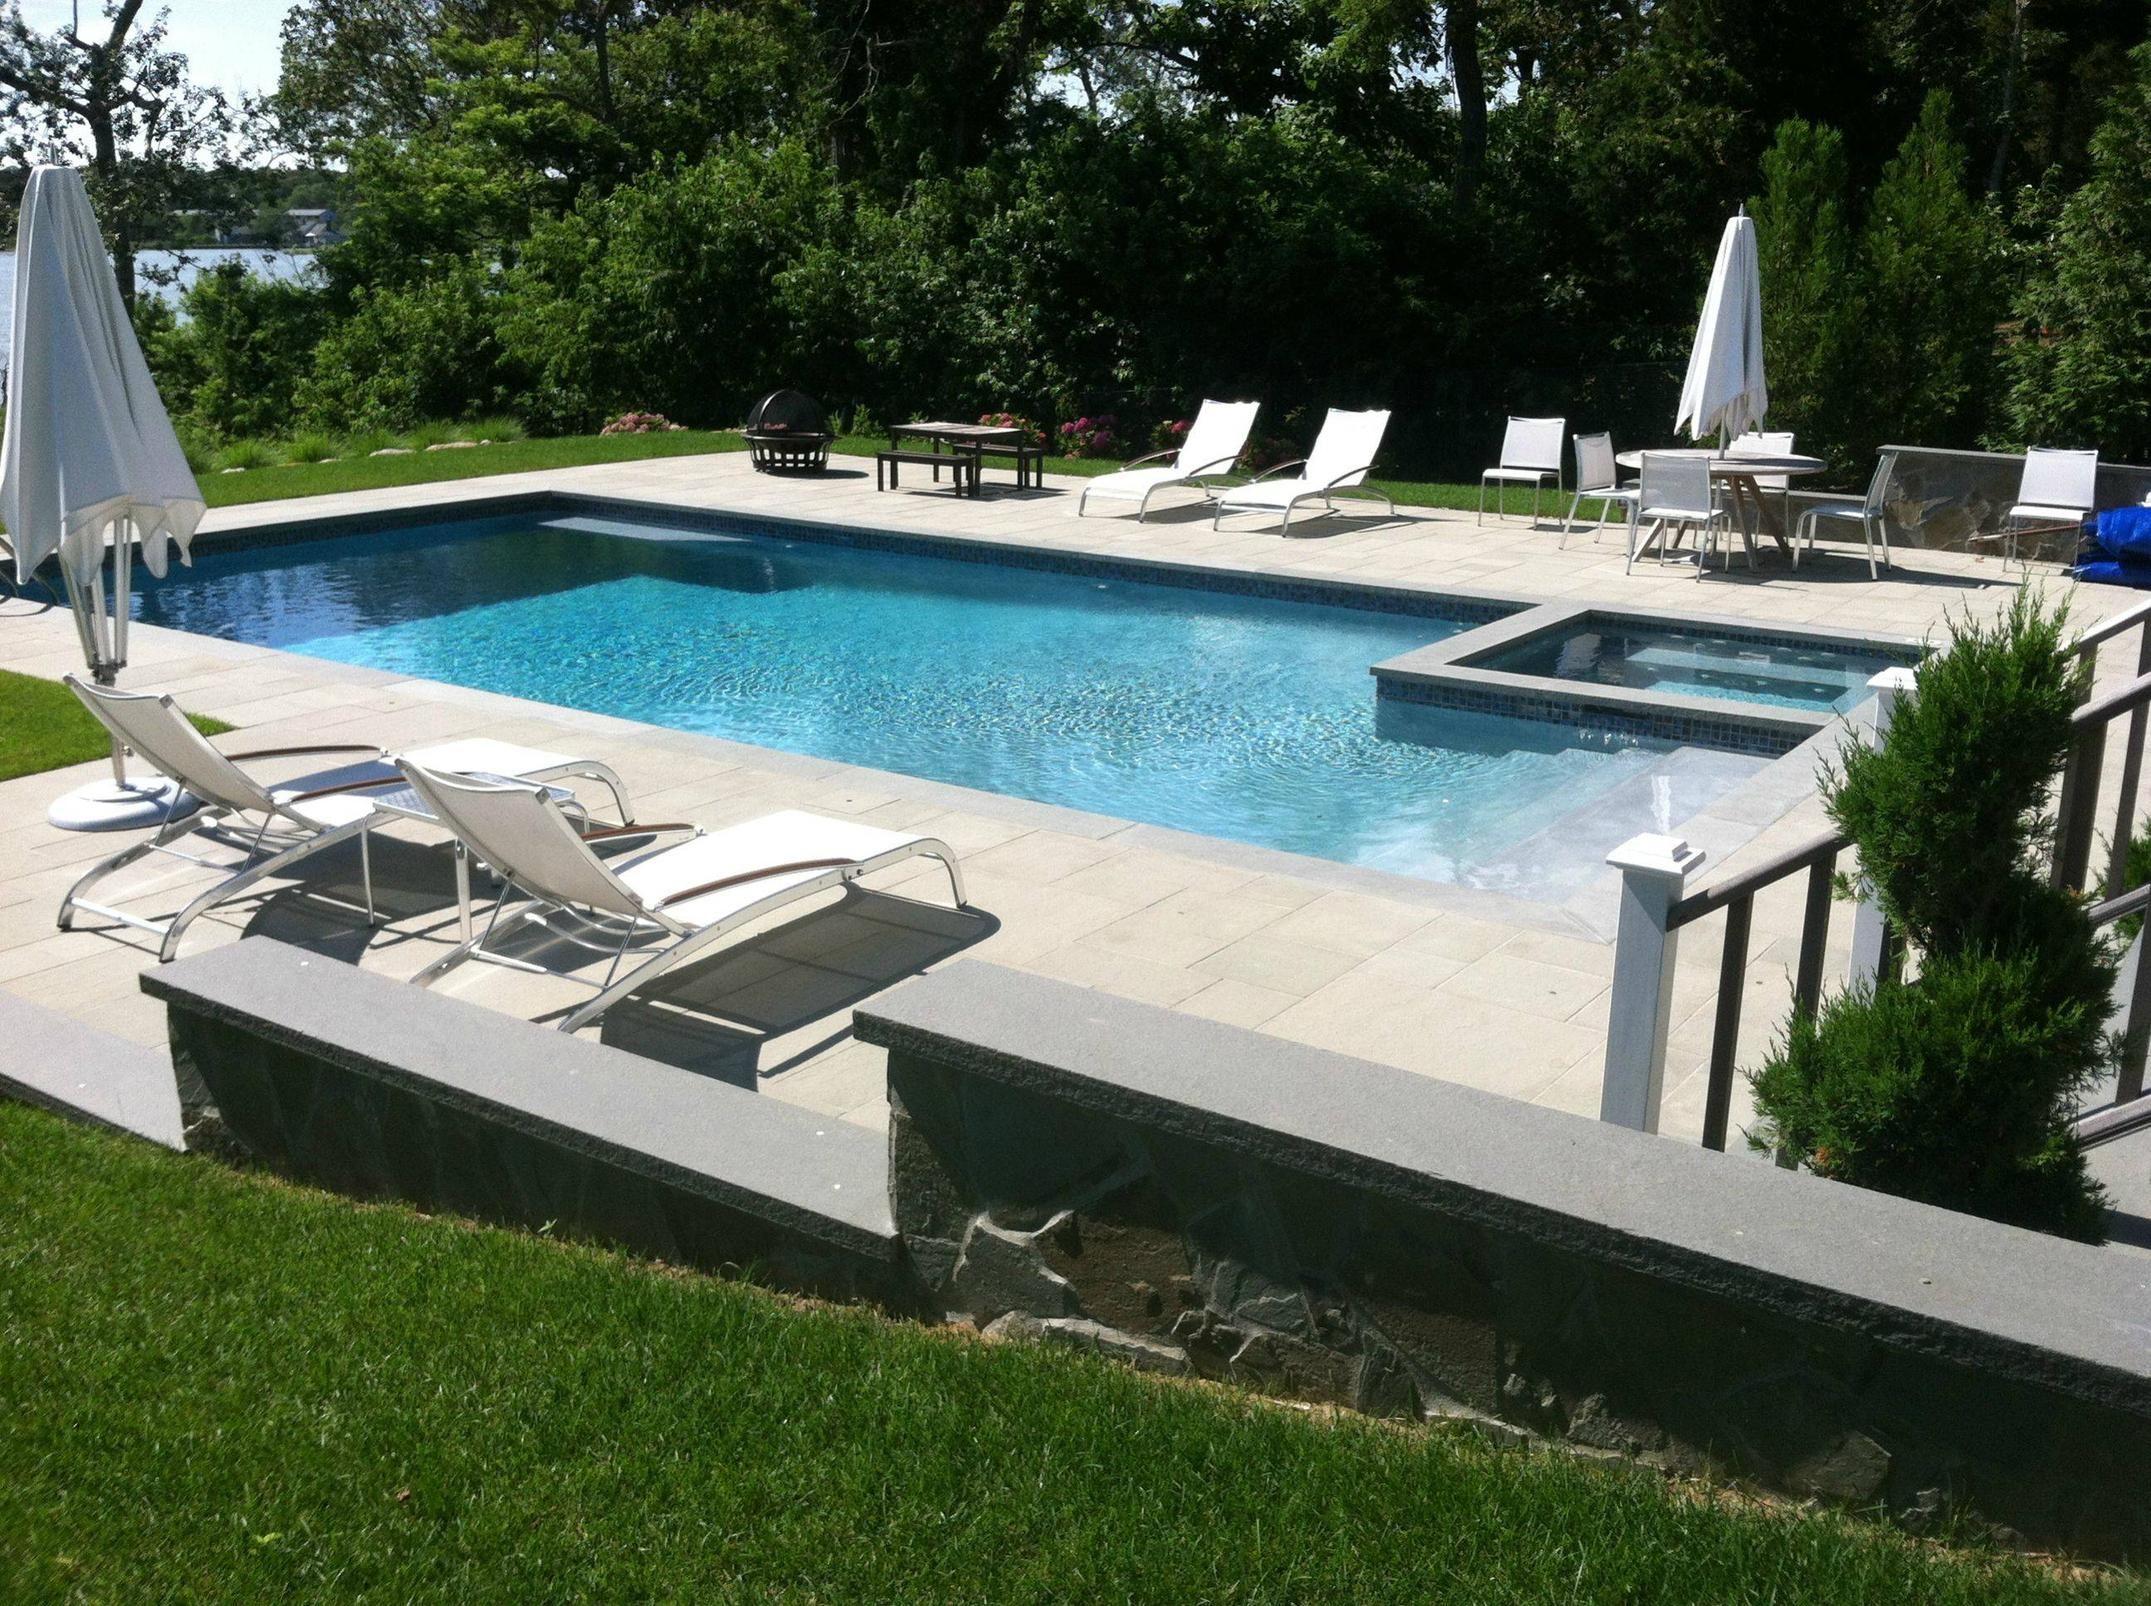 Gunite Pool U0026 Overflow Spa Combo With Bluestone Patio And Retaining Walls  Southampton